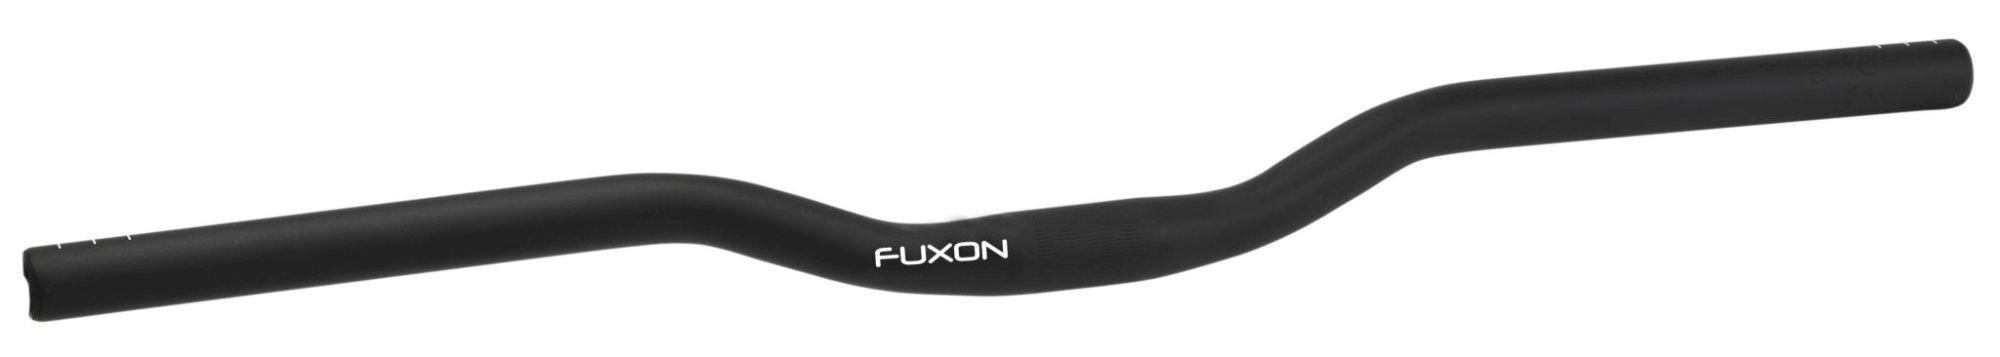 Fuxon Premio SL Lenker 25,4 / 620 mm, schwarz